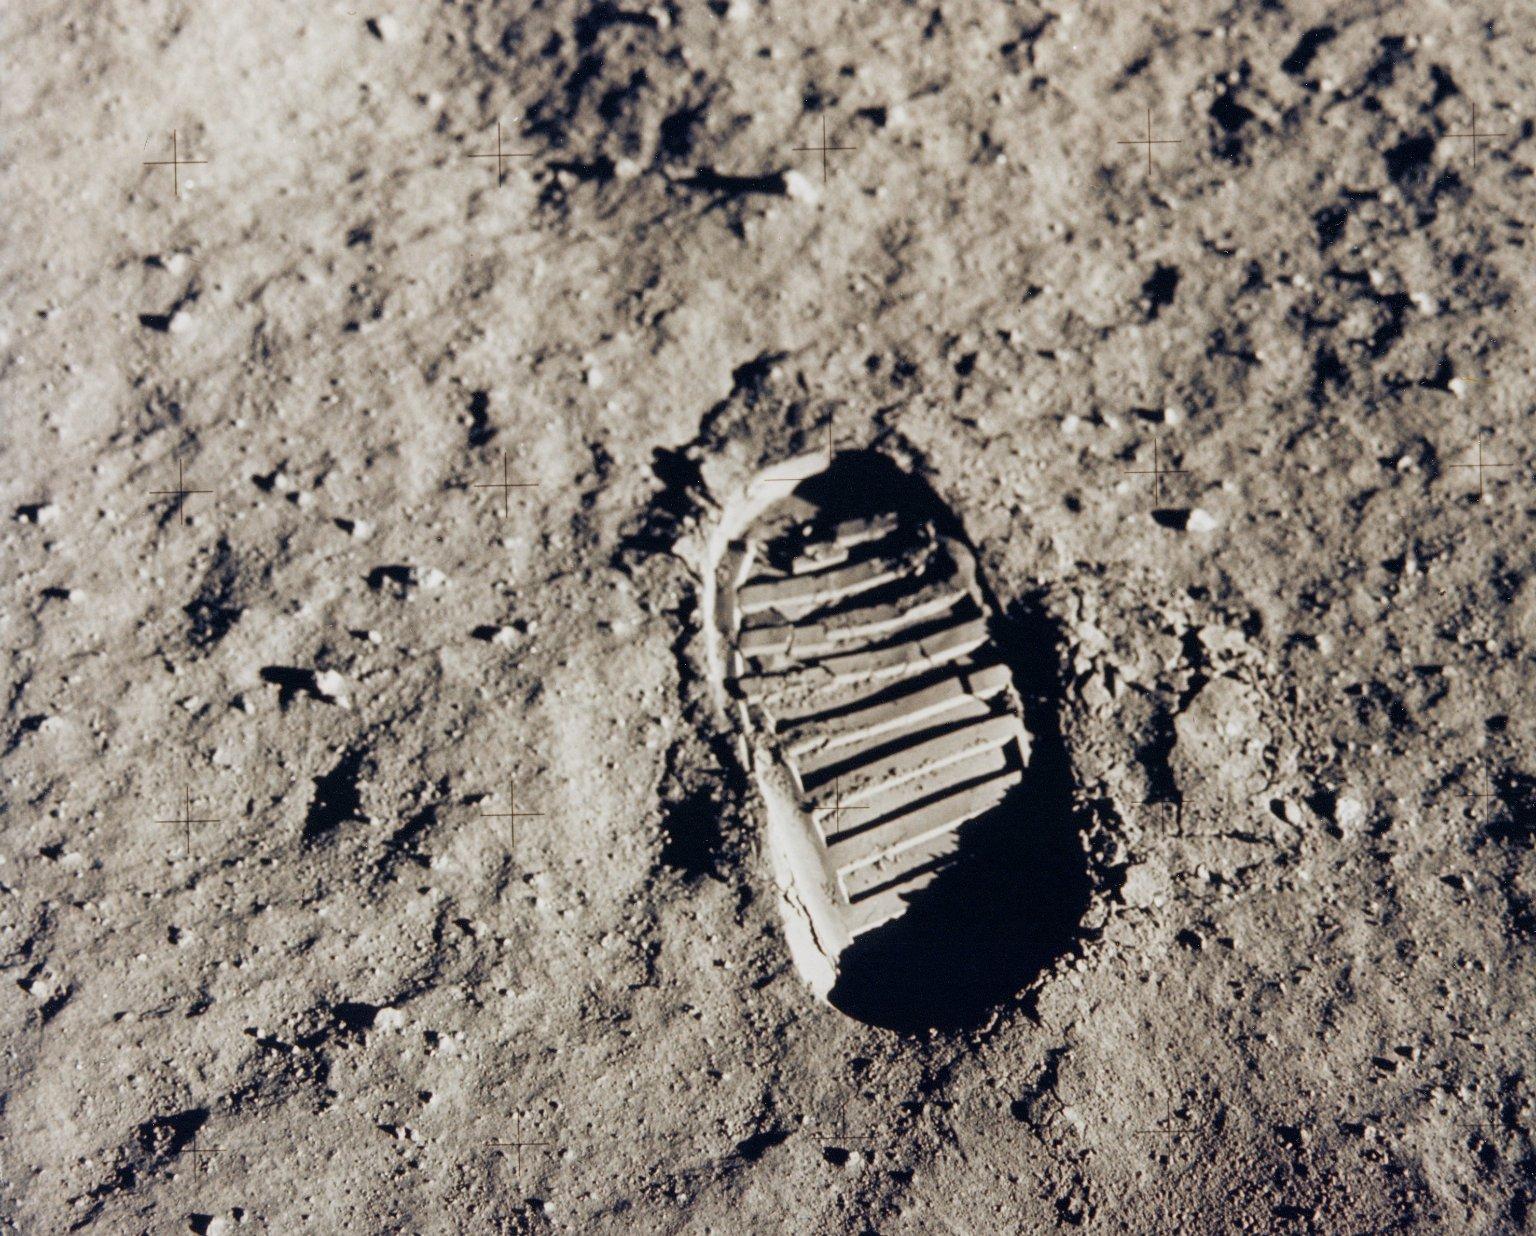 Footprint on the moon-1.jpg